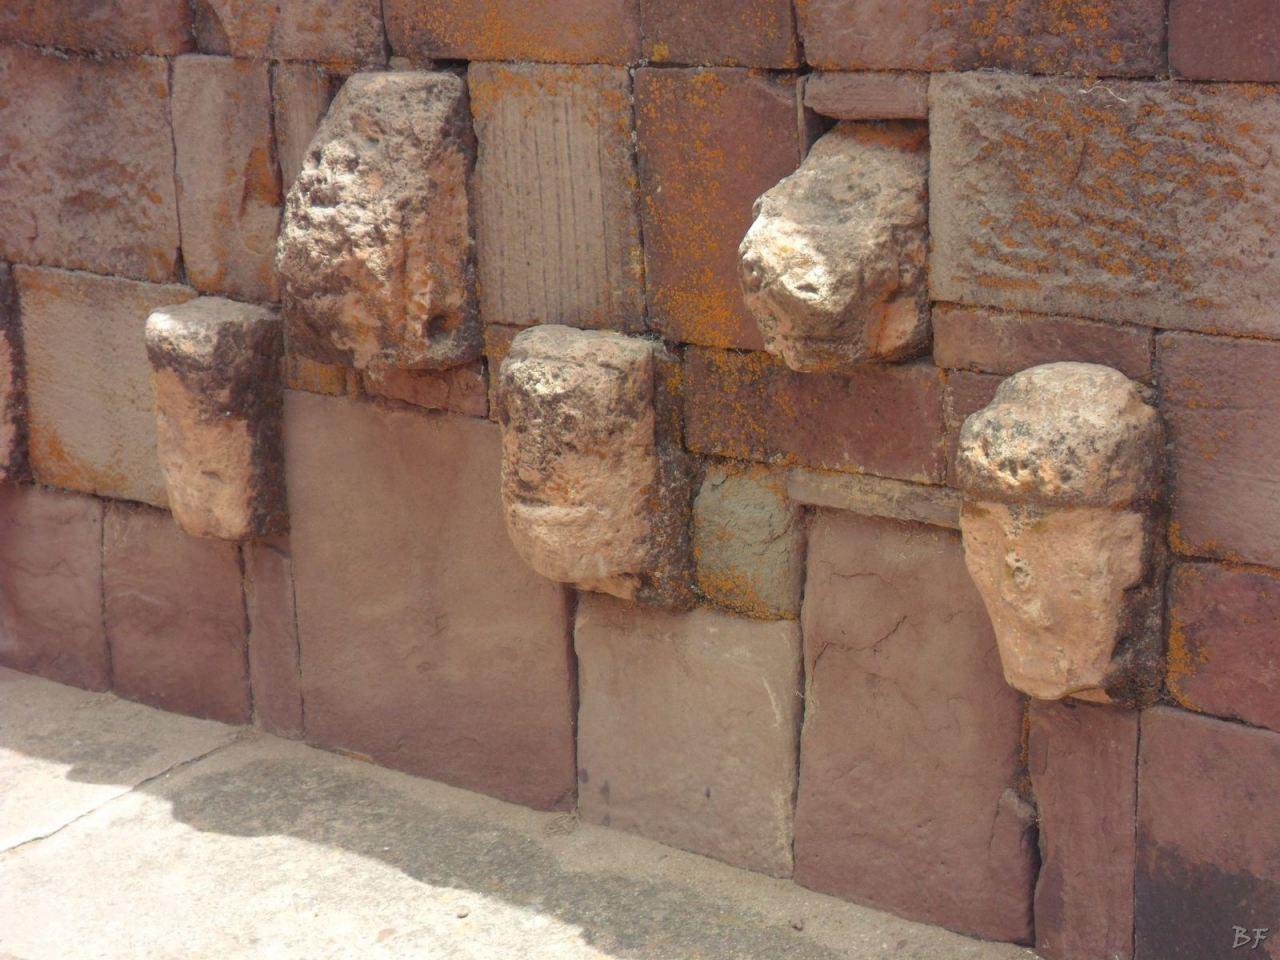 Sito-Megalitico-Piramide-Akapana-Kalasasaya-Menhir-Tiahuanaco-Bolivia-83